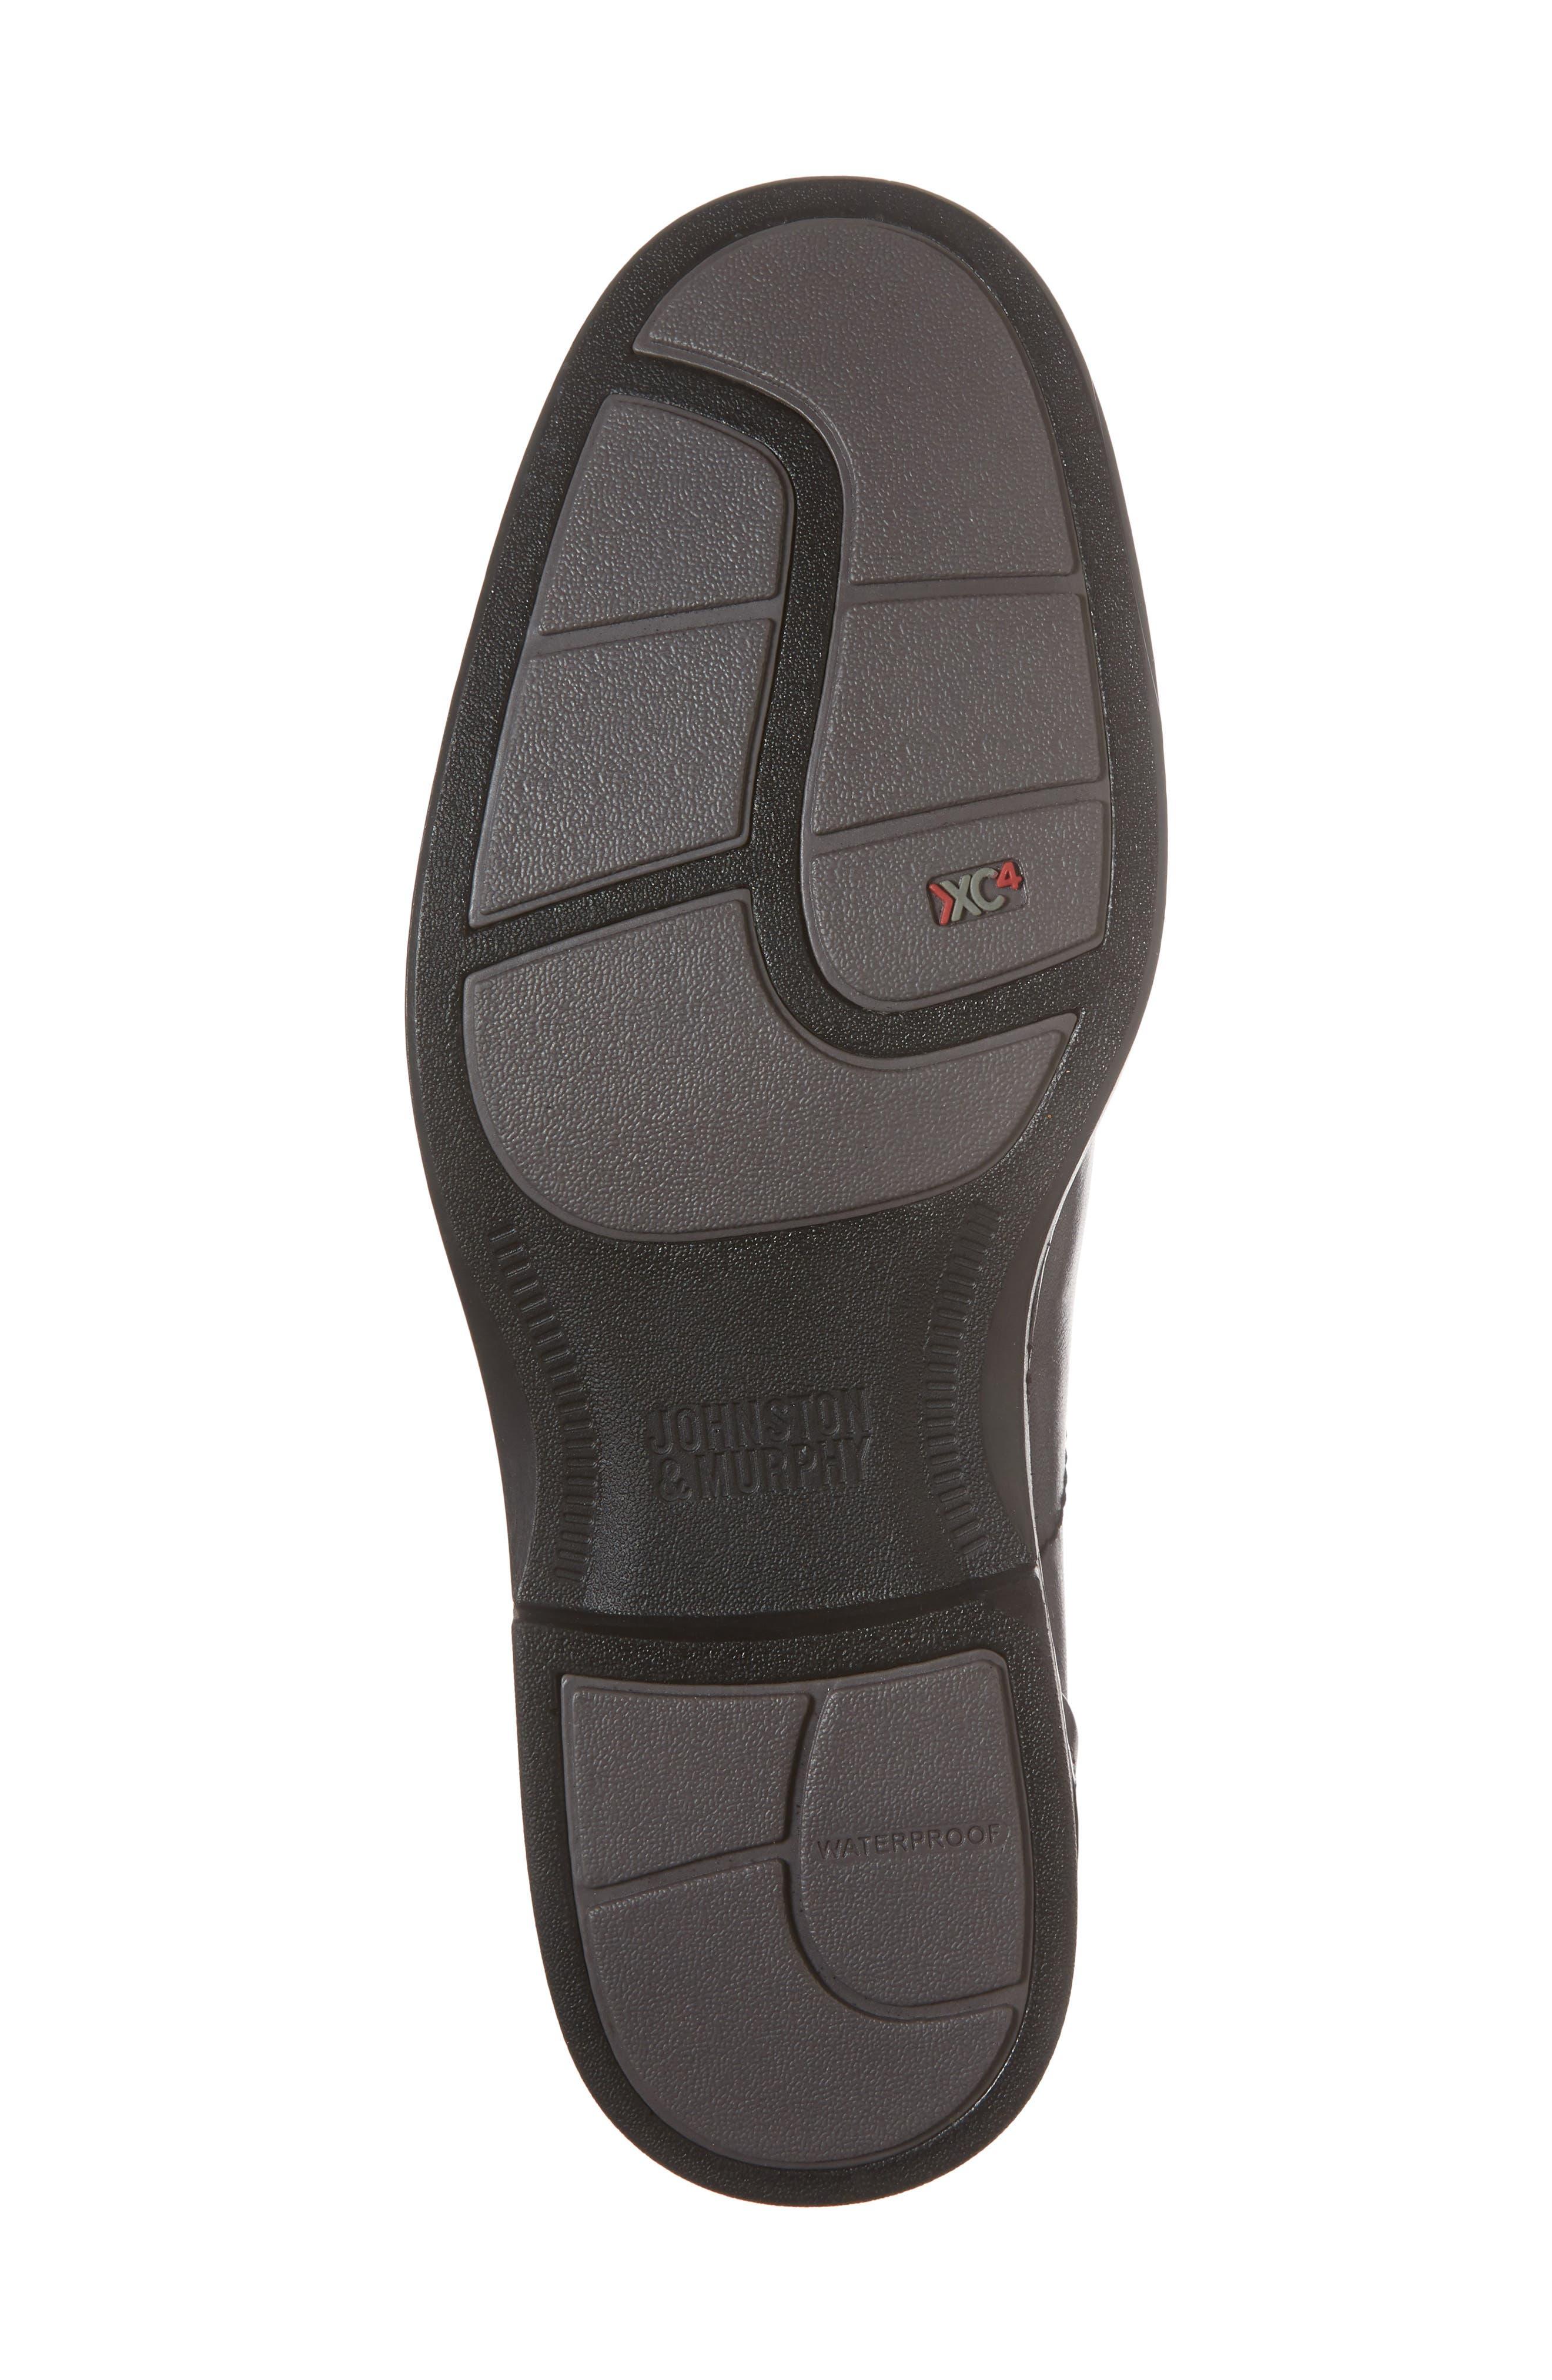 Stanton Runoff XC4<sup>®</sup> Bike Toe Slip-On,                             Alternate thumbnail 6, color,                             Black Leather